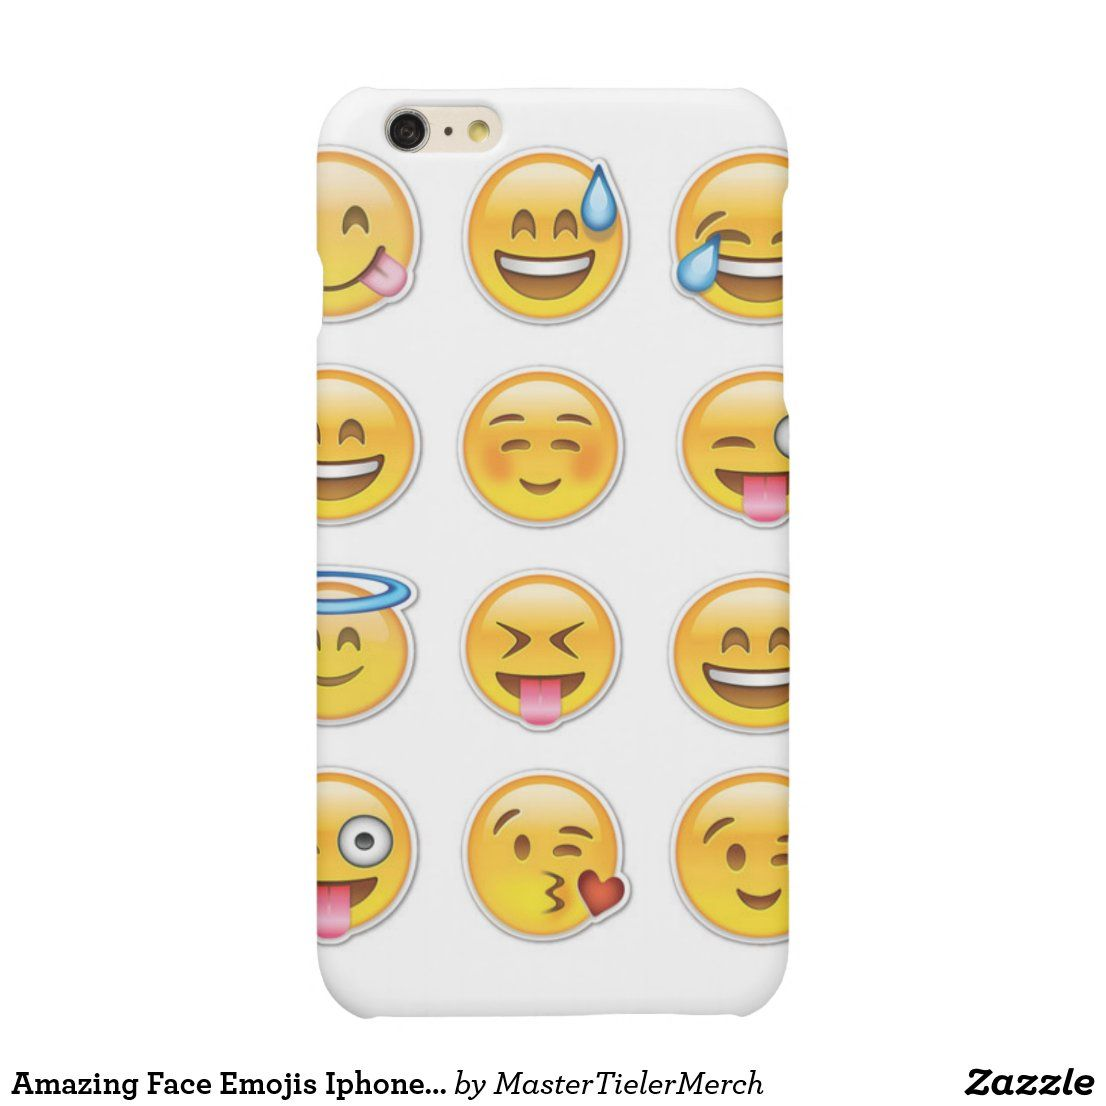 Amazing Face Emojis Iphone 6plus Case Zazzle Com Iphone 6 Plus Case Emoji Phone Cases Case